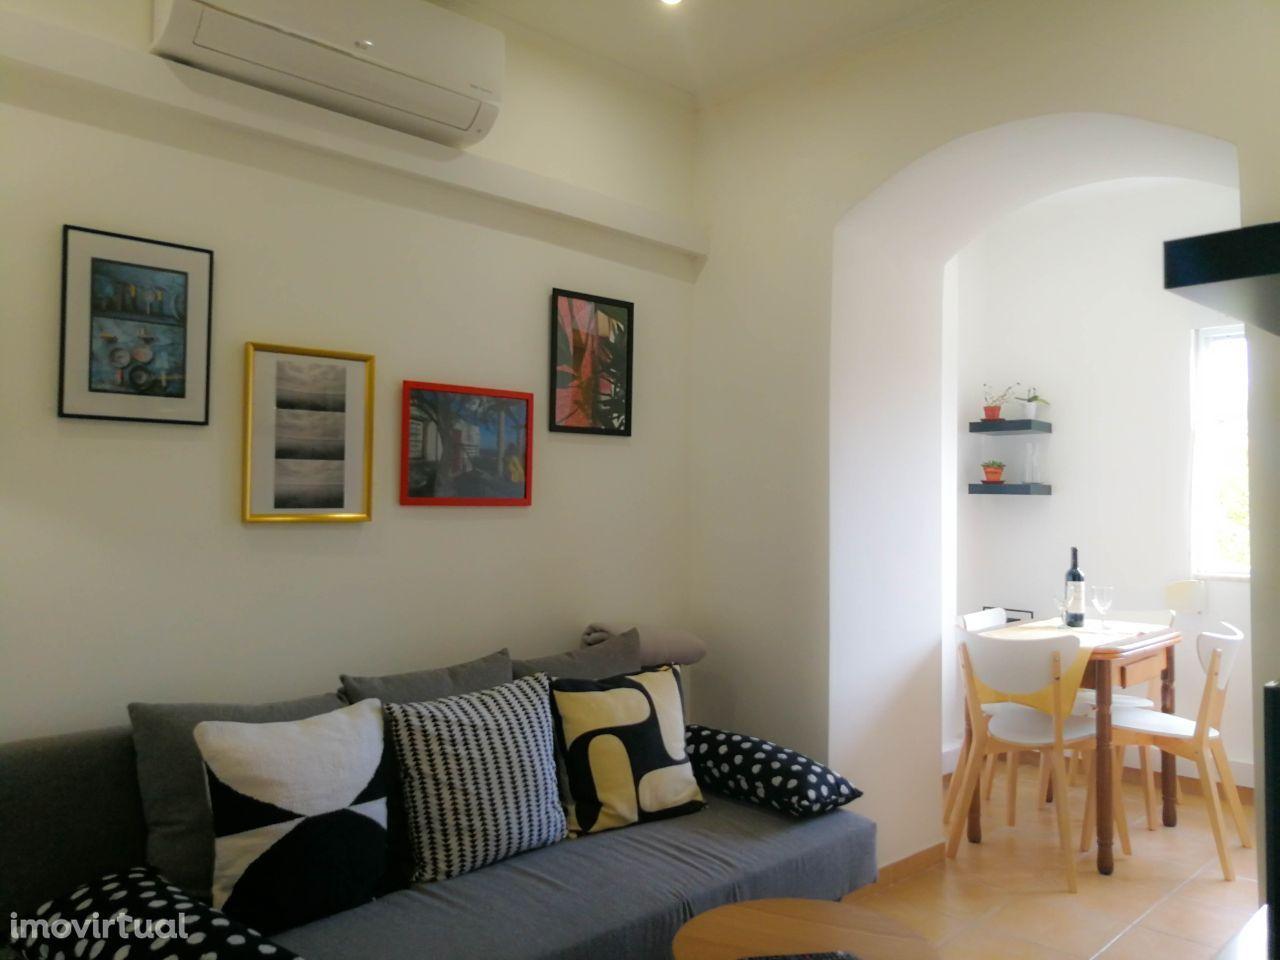 2 Bedroom Apartment for sale - Rua Cruz á Alcântara